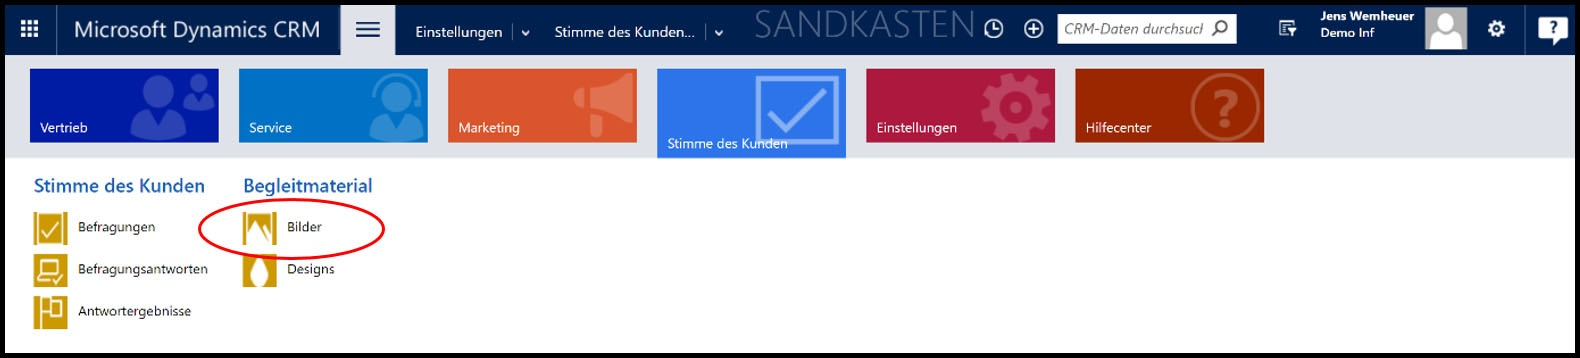 Microsoft Dynamics 365 Bilderkonfiguration